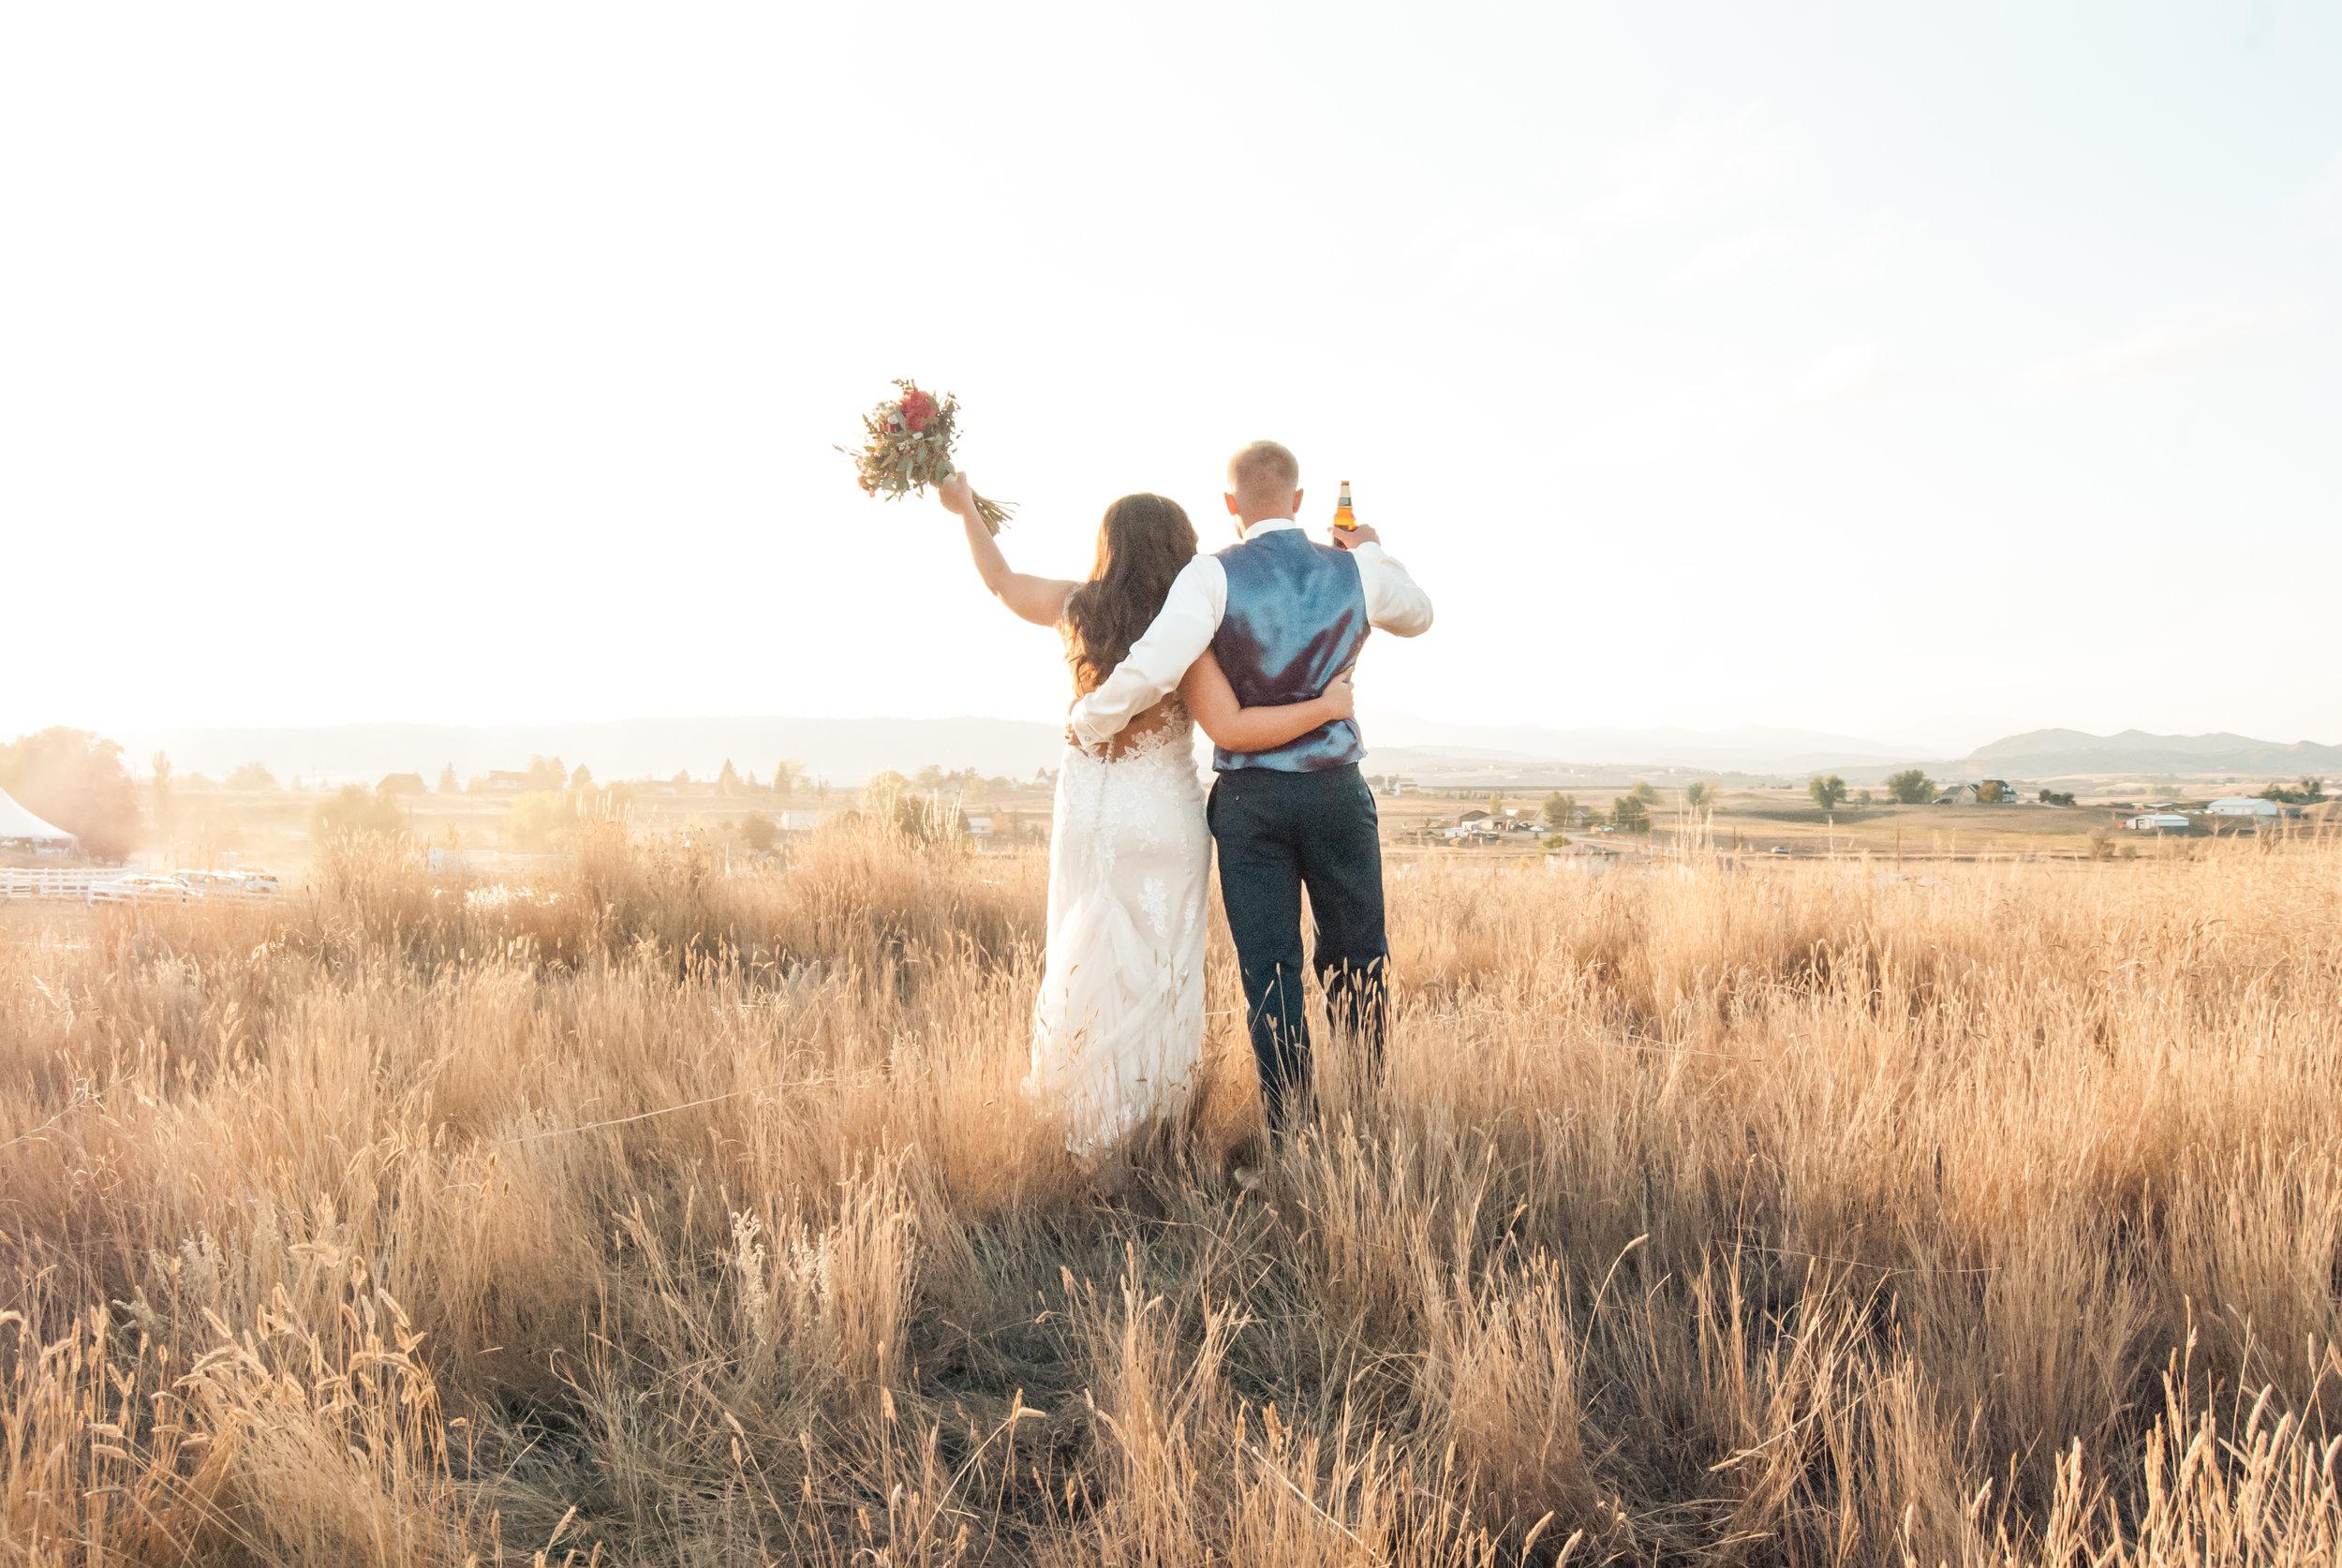 WeddingPortfolio-114.jpg